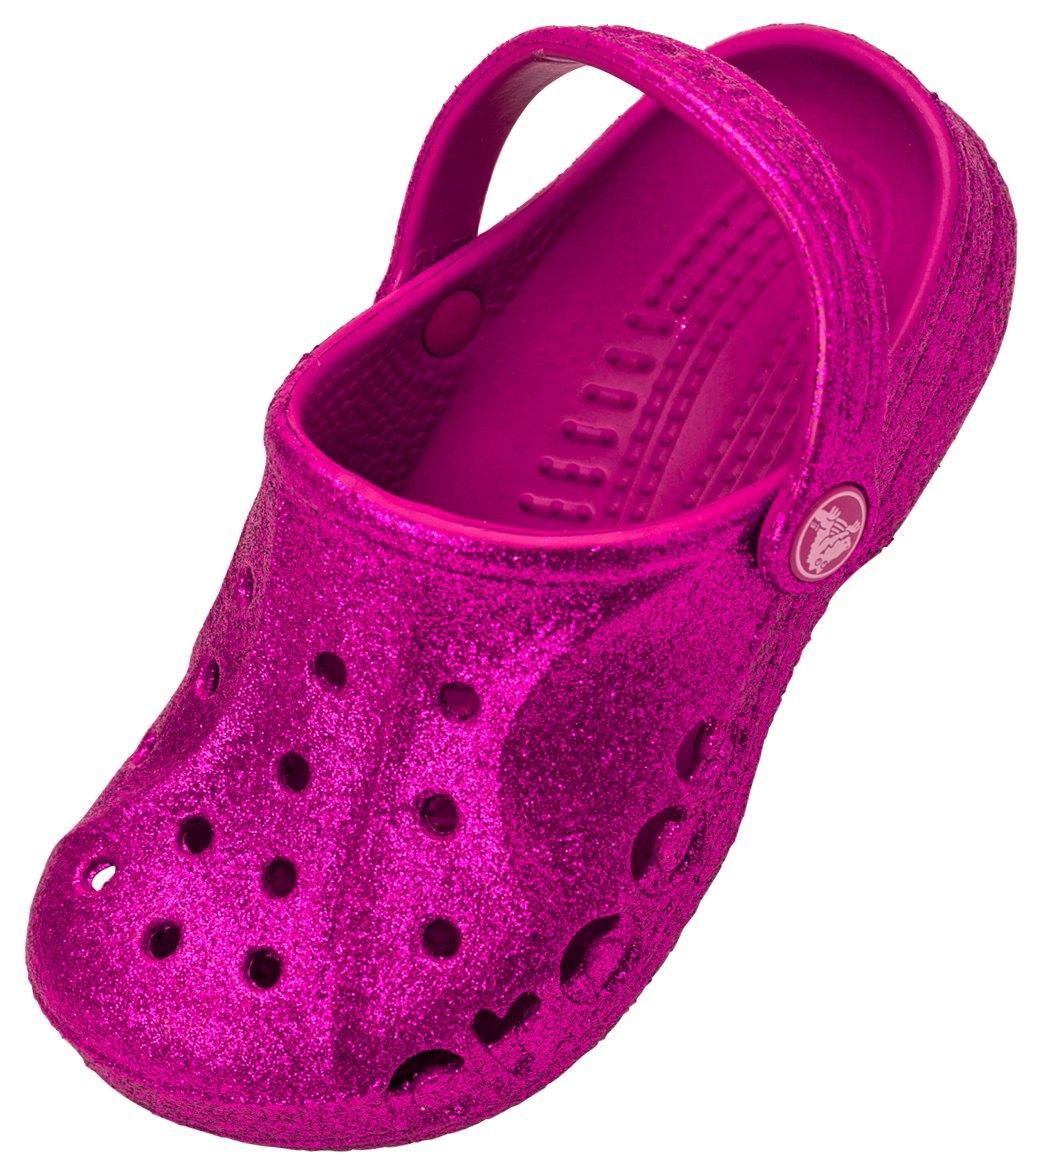 13f2b67122 Crocs Girls' Baya Hi Glitter Clog (Toddler/ Little Kid/ Big Kid) at ...